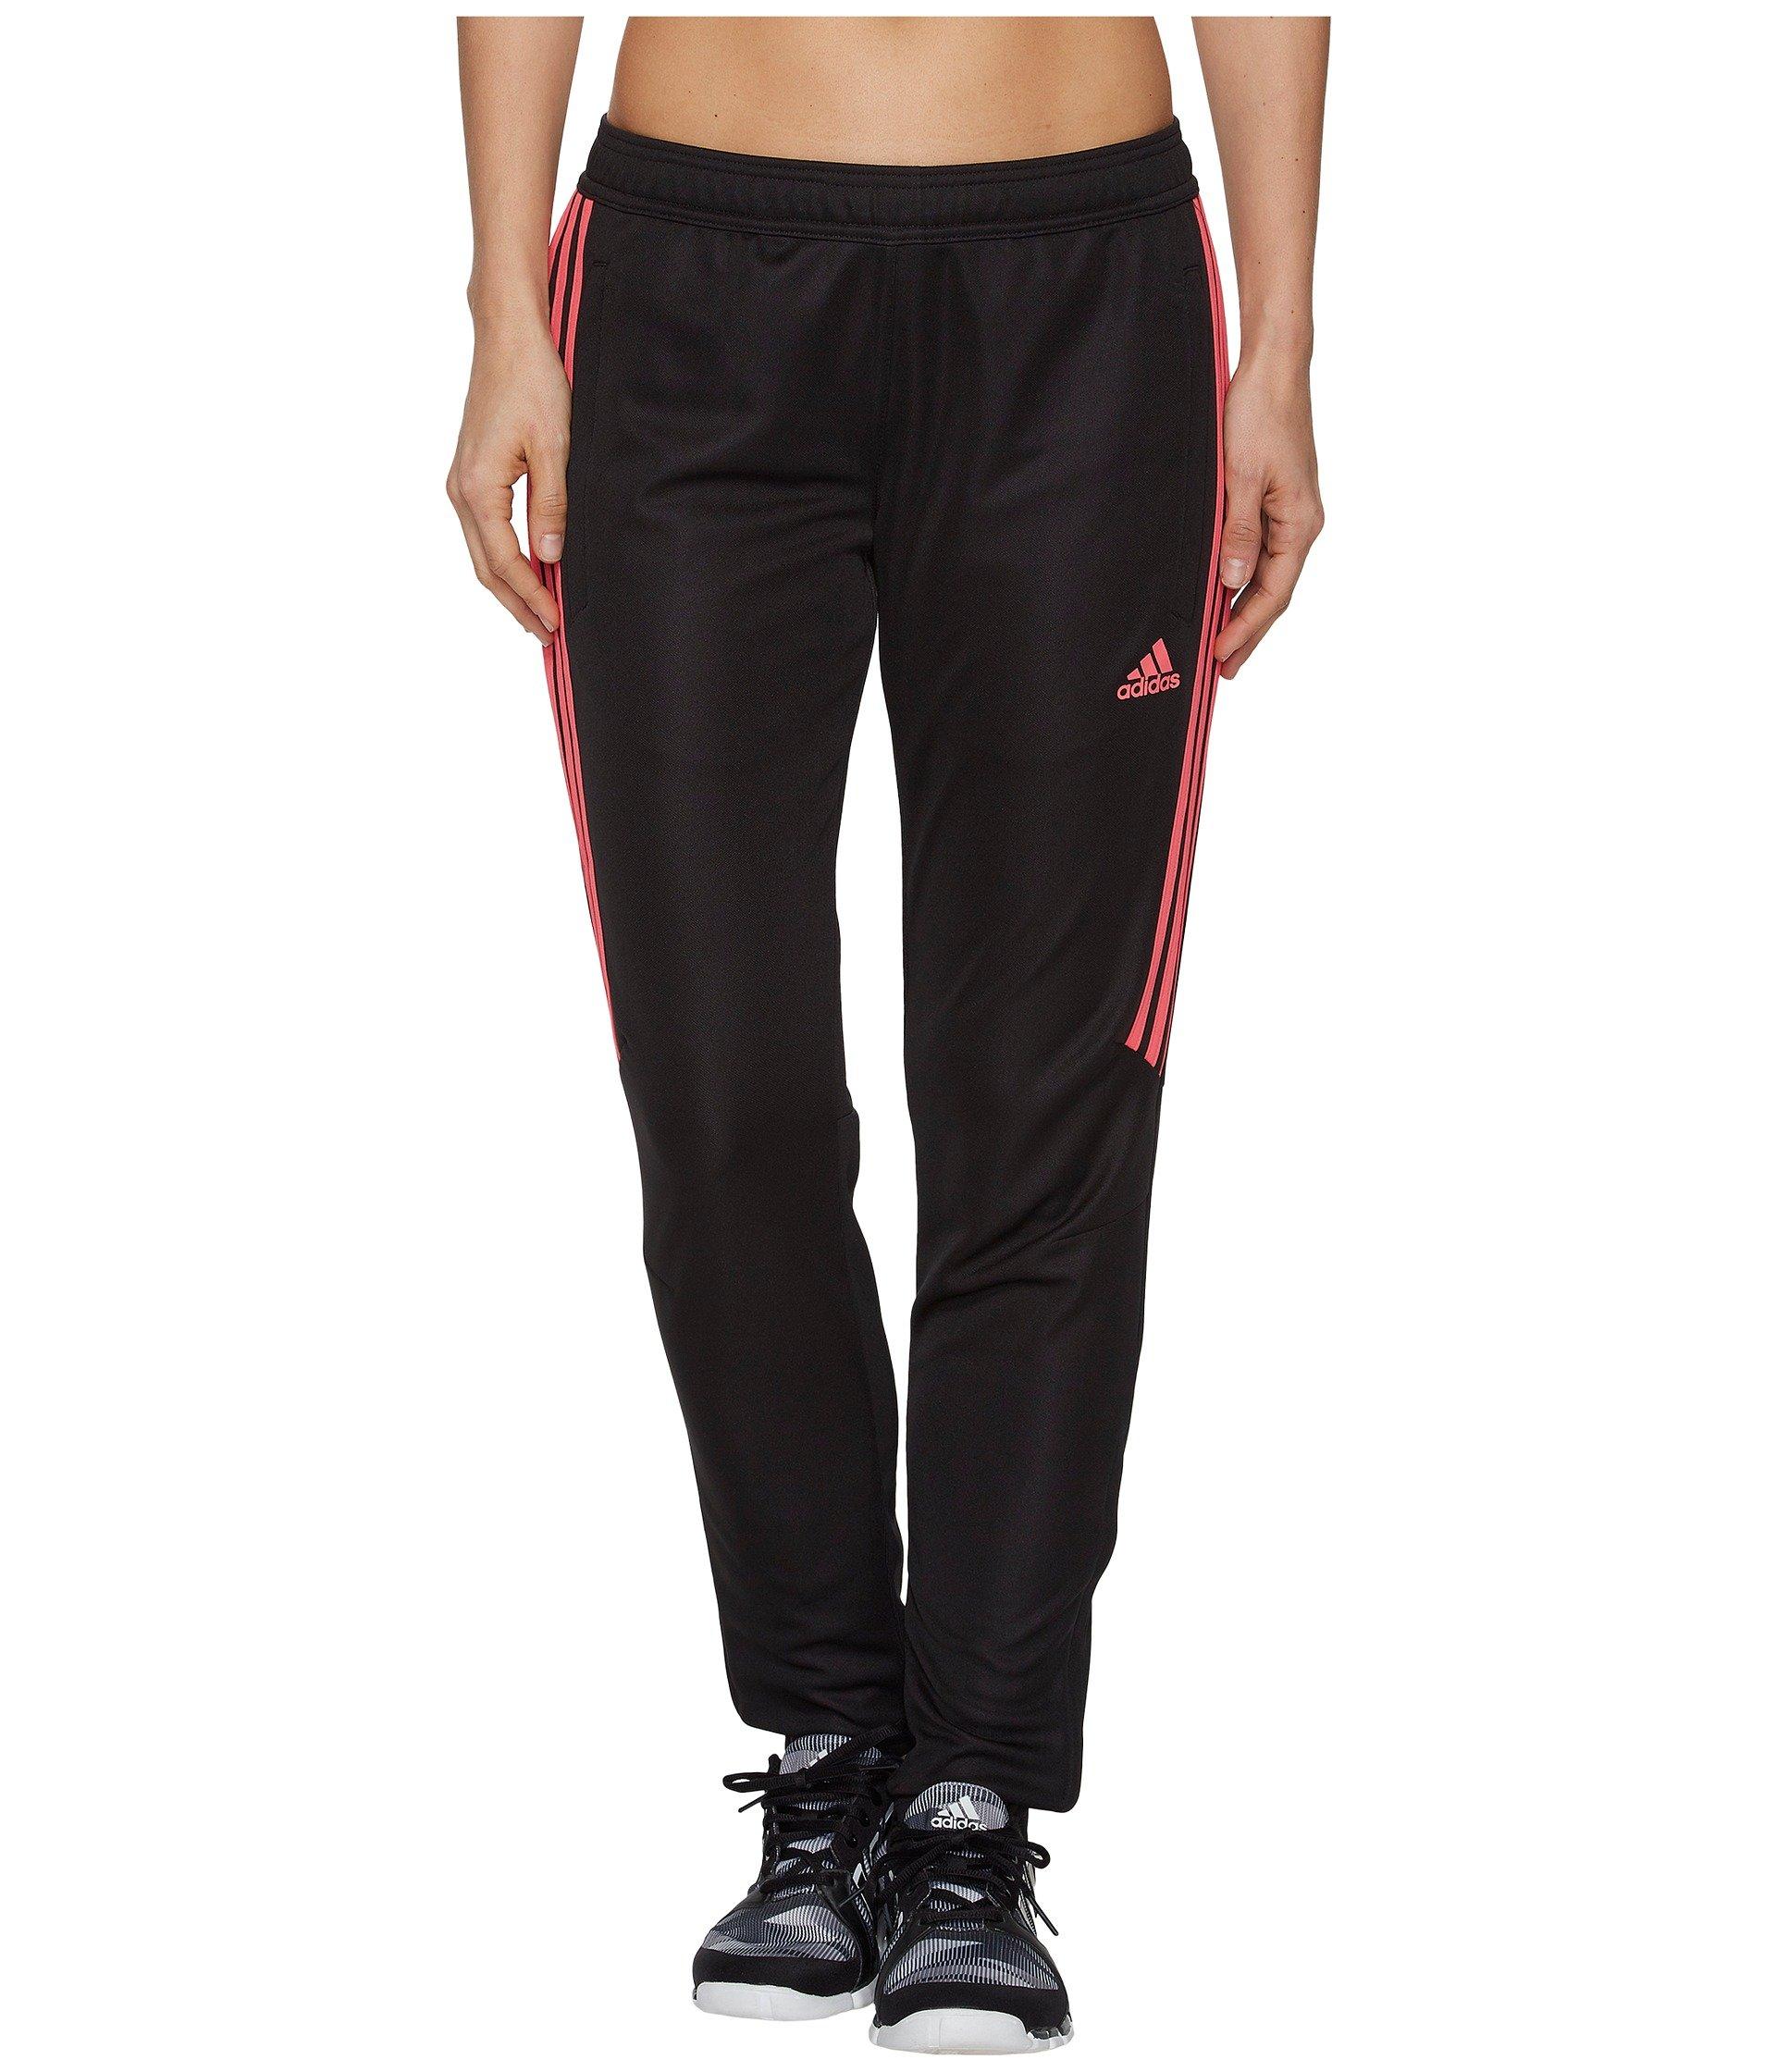 adidas Women's Tiro '17 Pants Black/Real Pink X-Small 32 by adidas